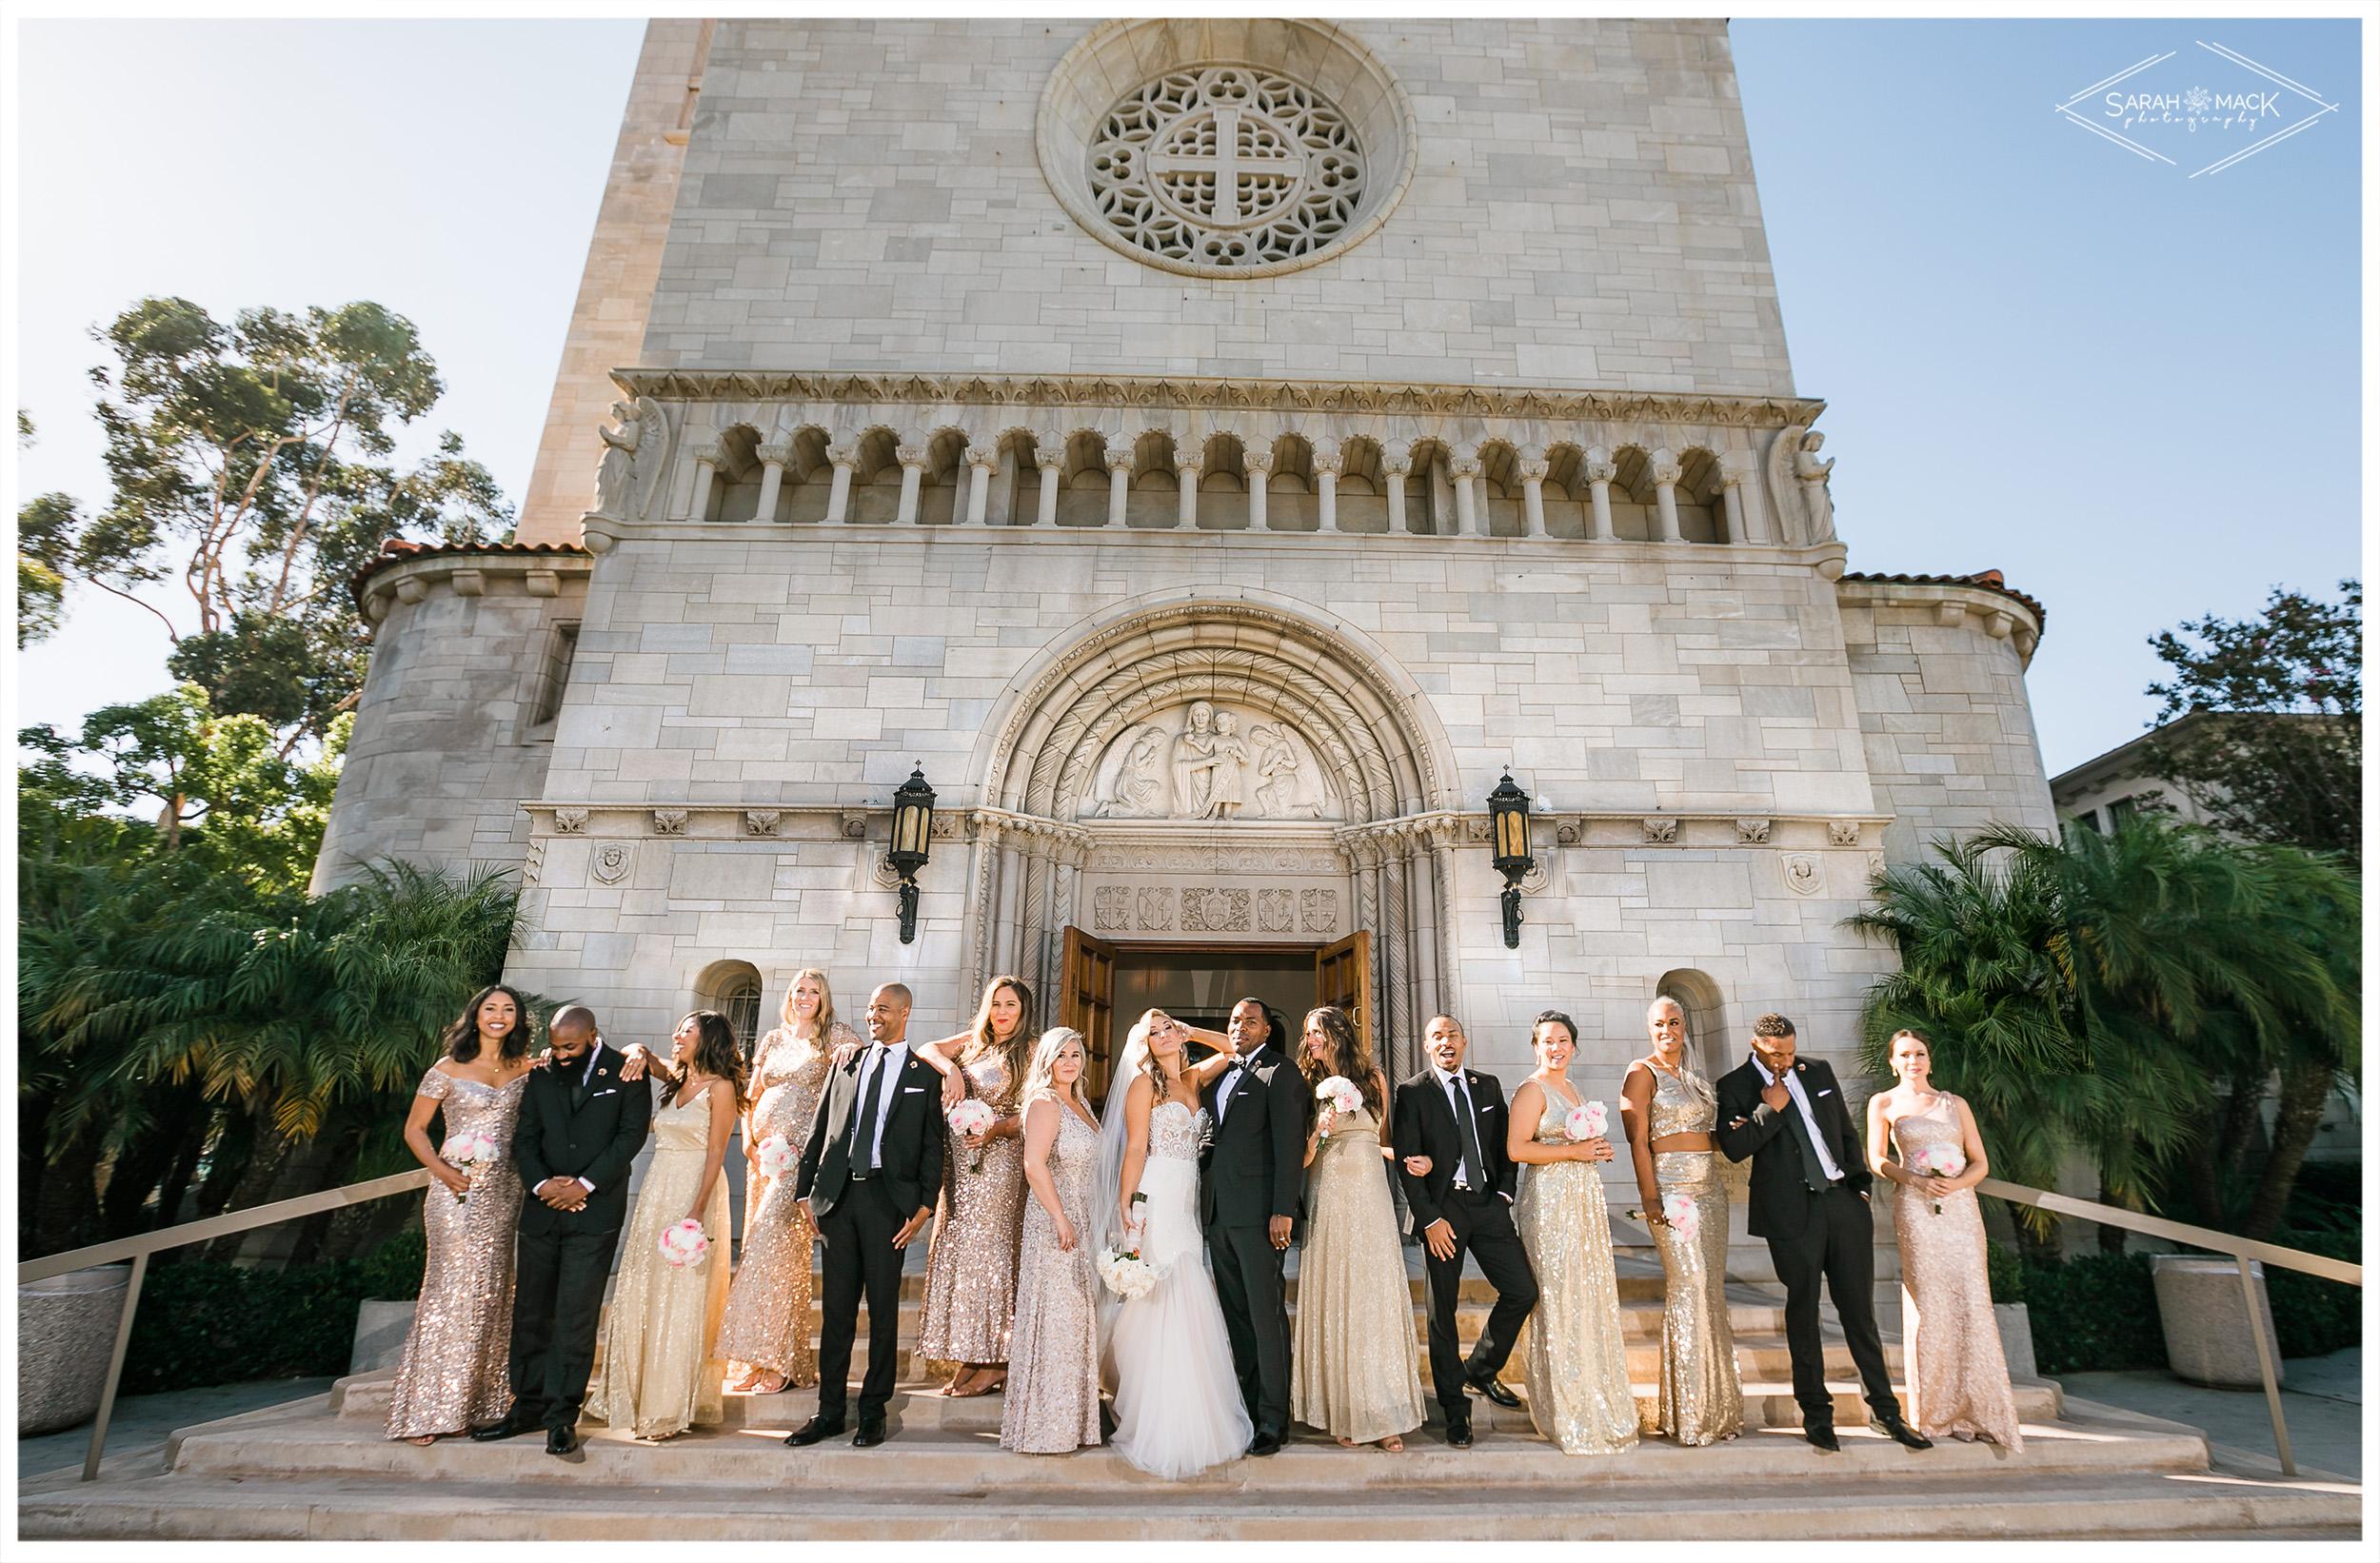 MK-Santa-Monica-Catholic-Church-Wedding-Photography-34.jpg